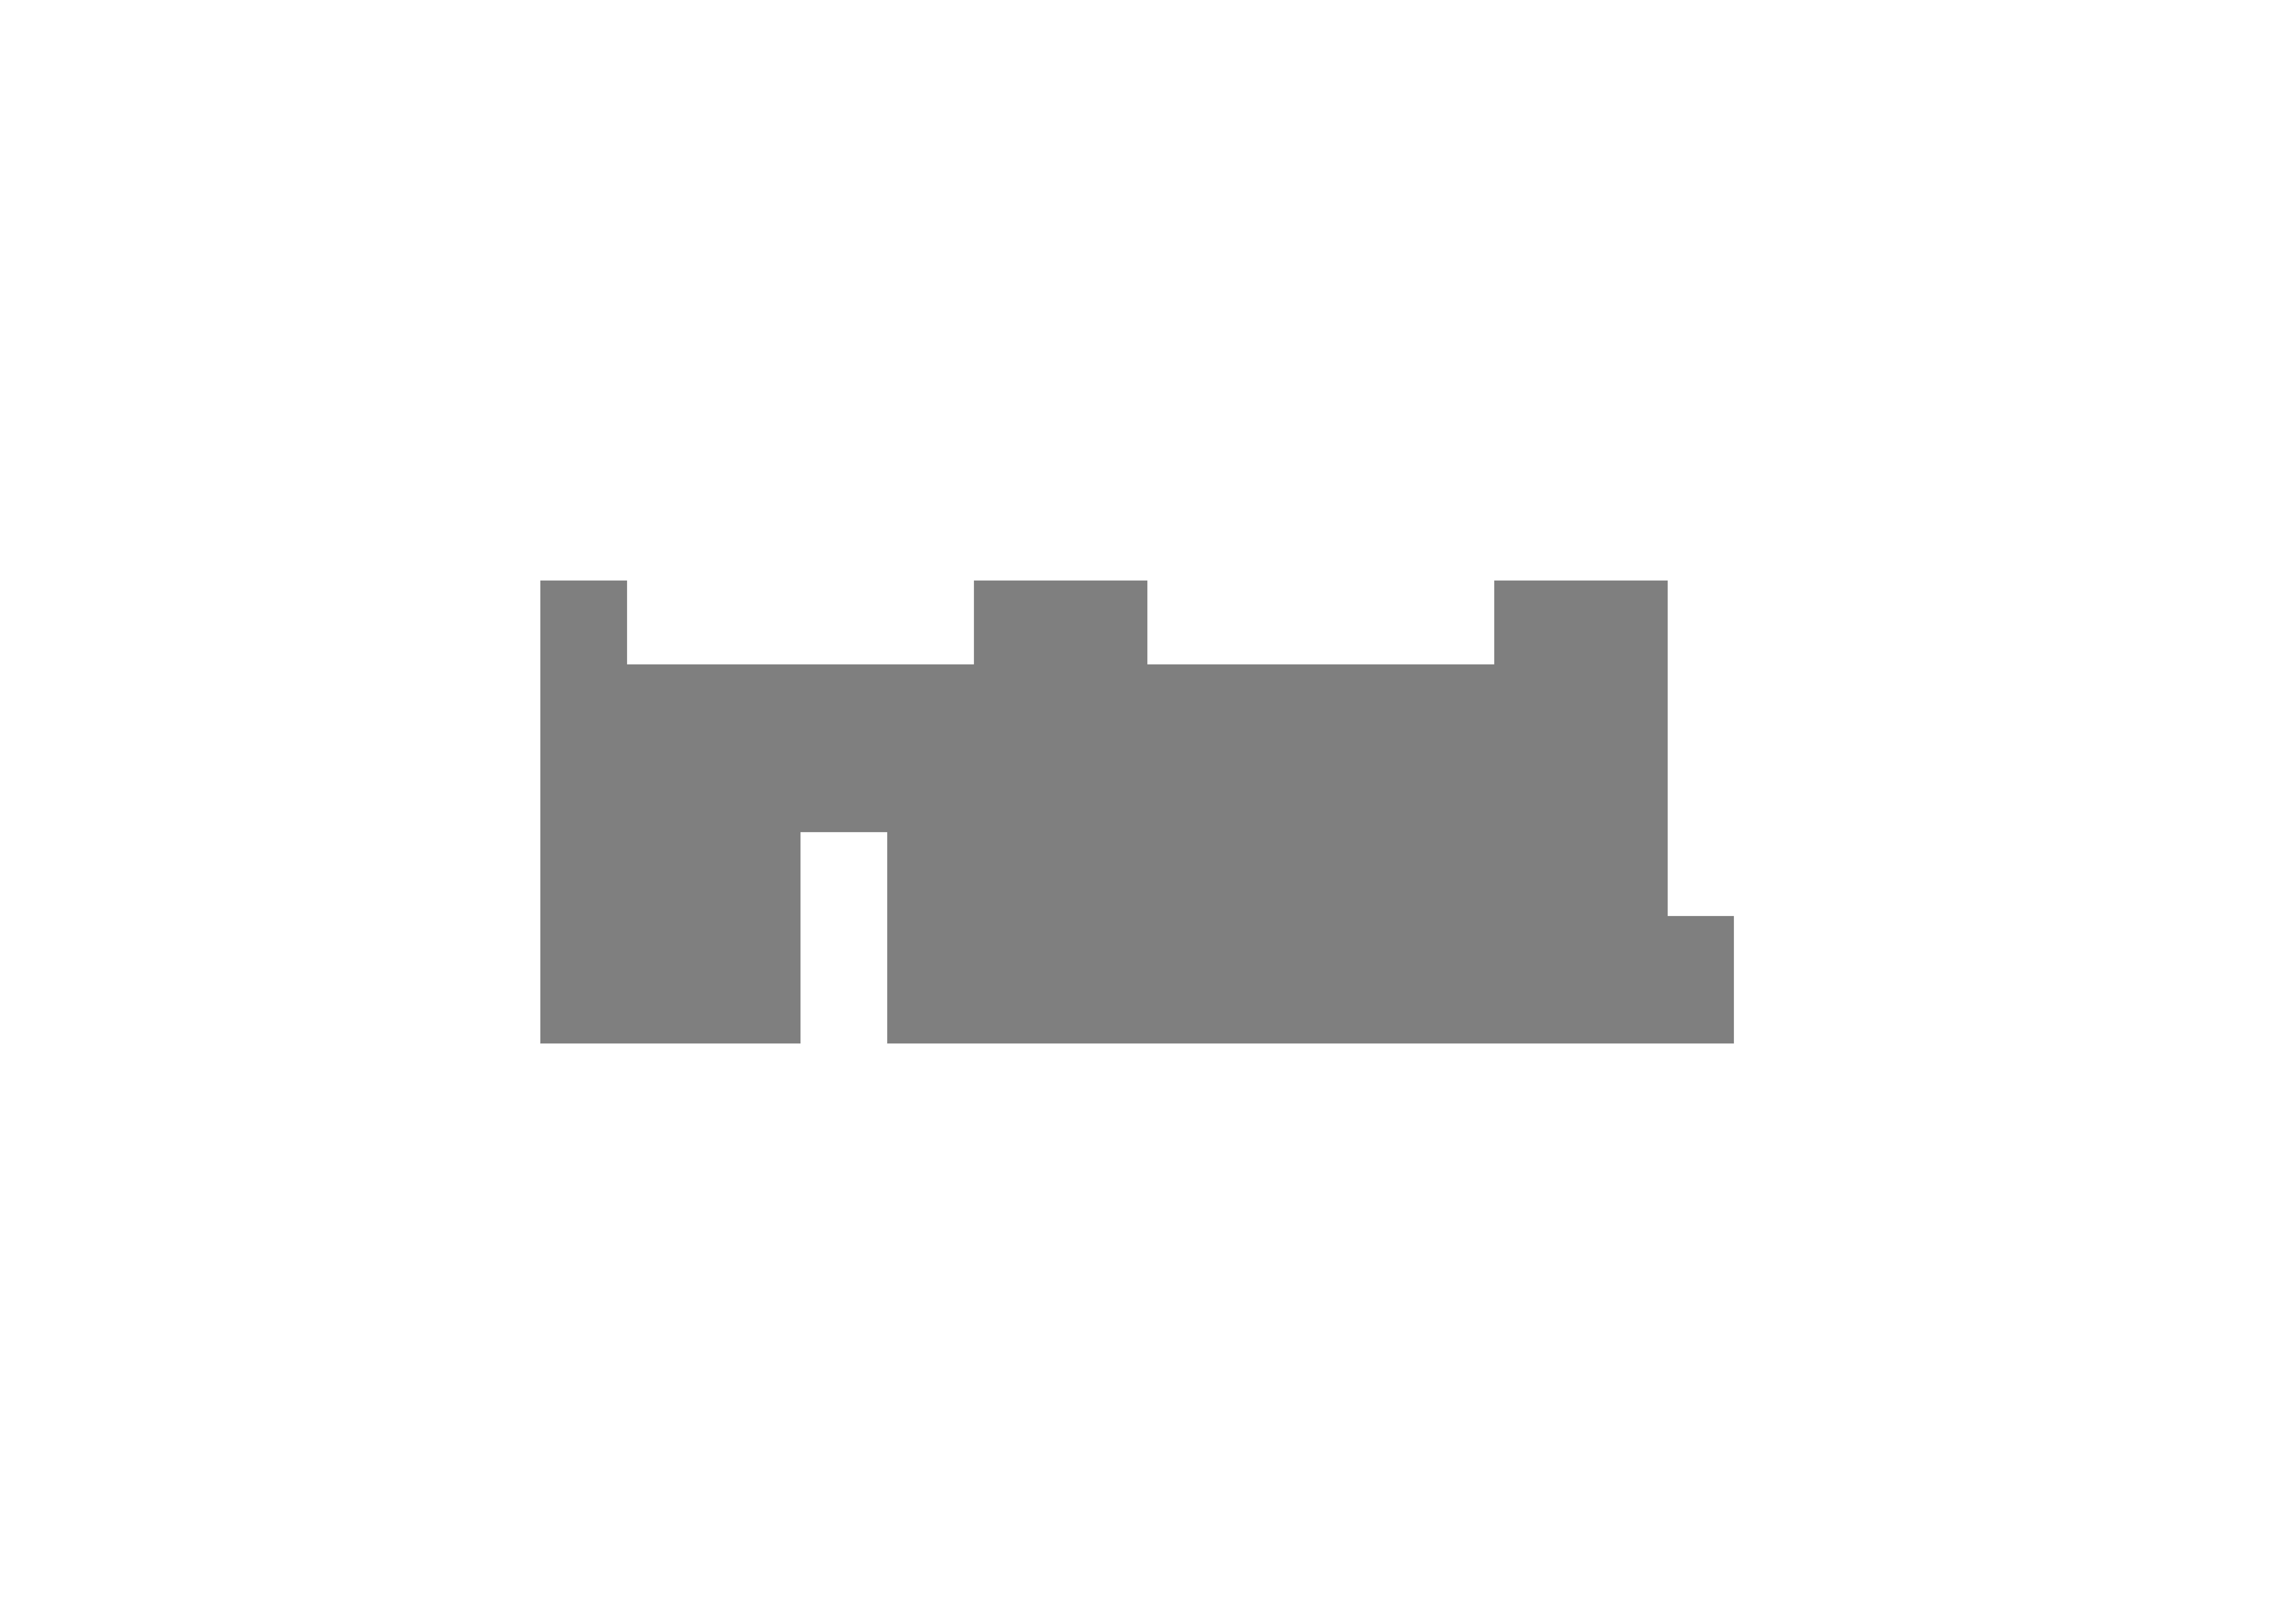 intel-logo-8 black